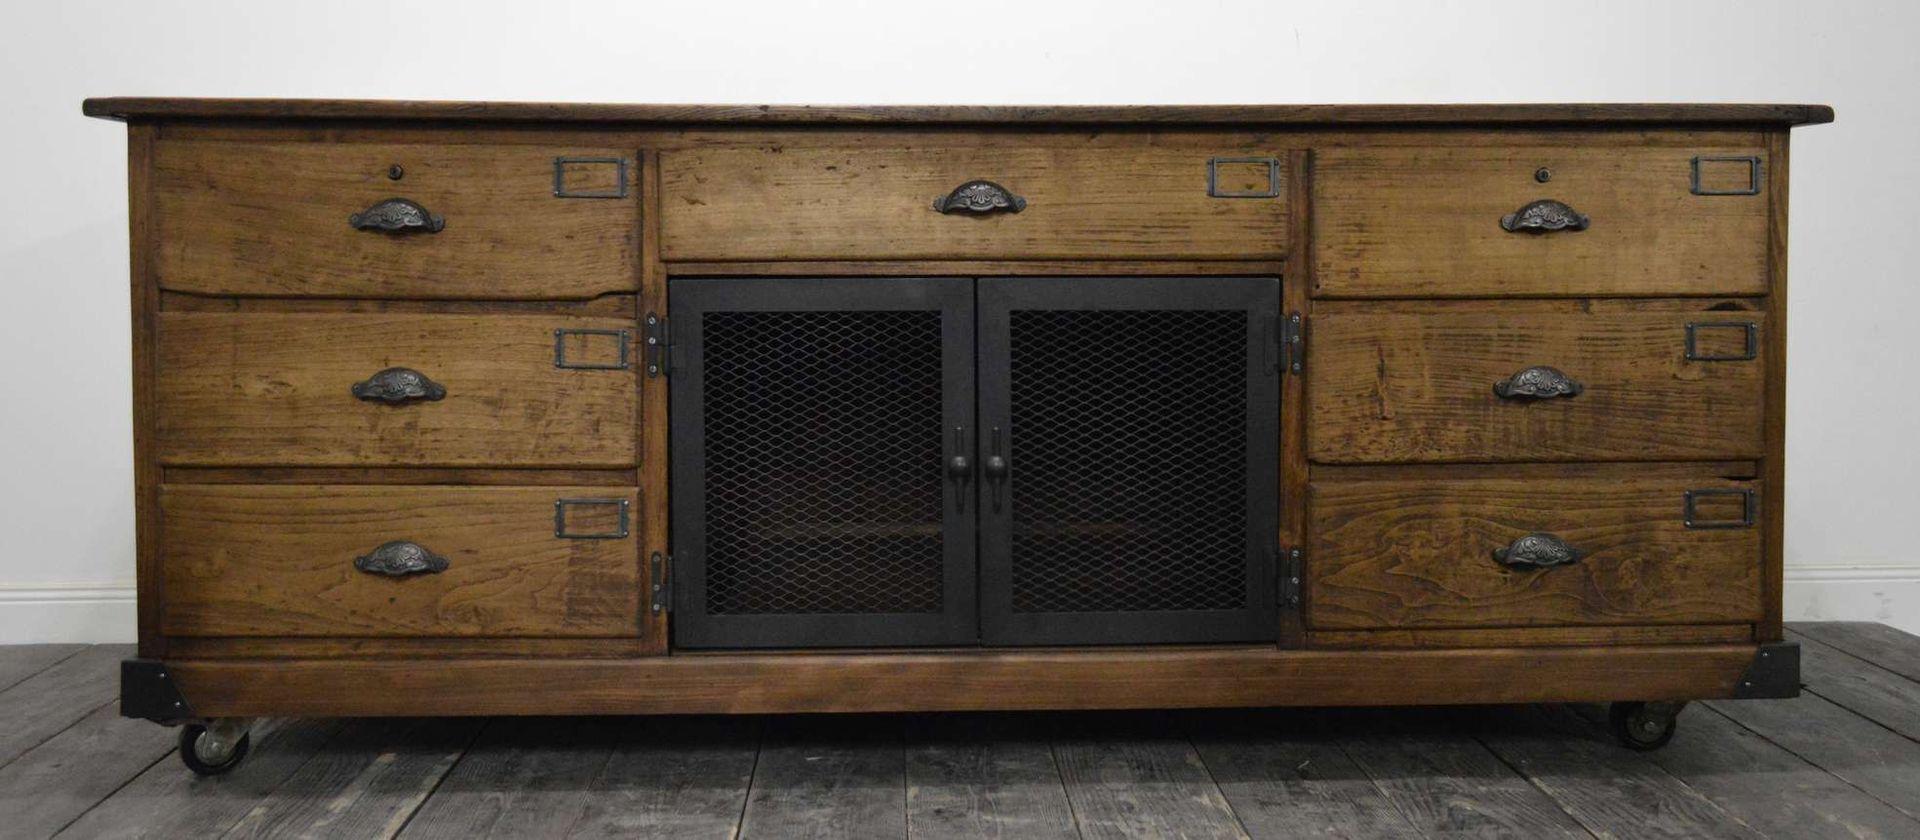 vintage tannenholz schrank bei pamono kaufen. Black Bedroom Furniture Sets. Home Design Ideas